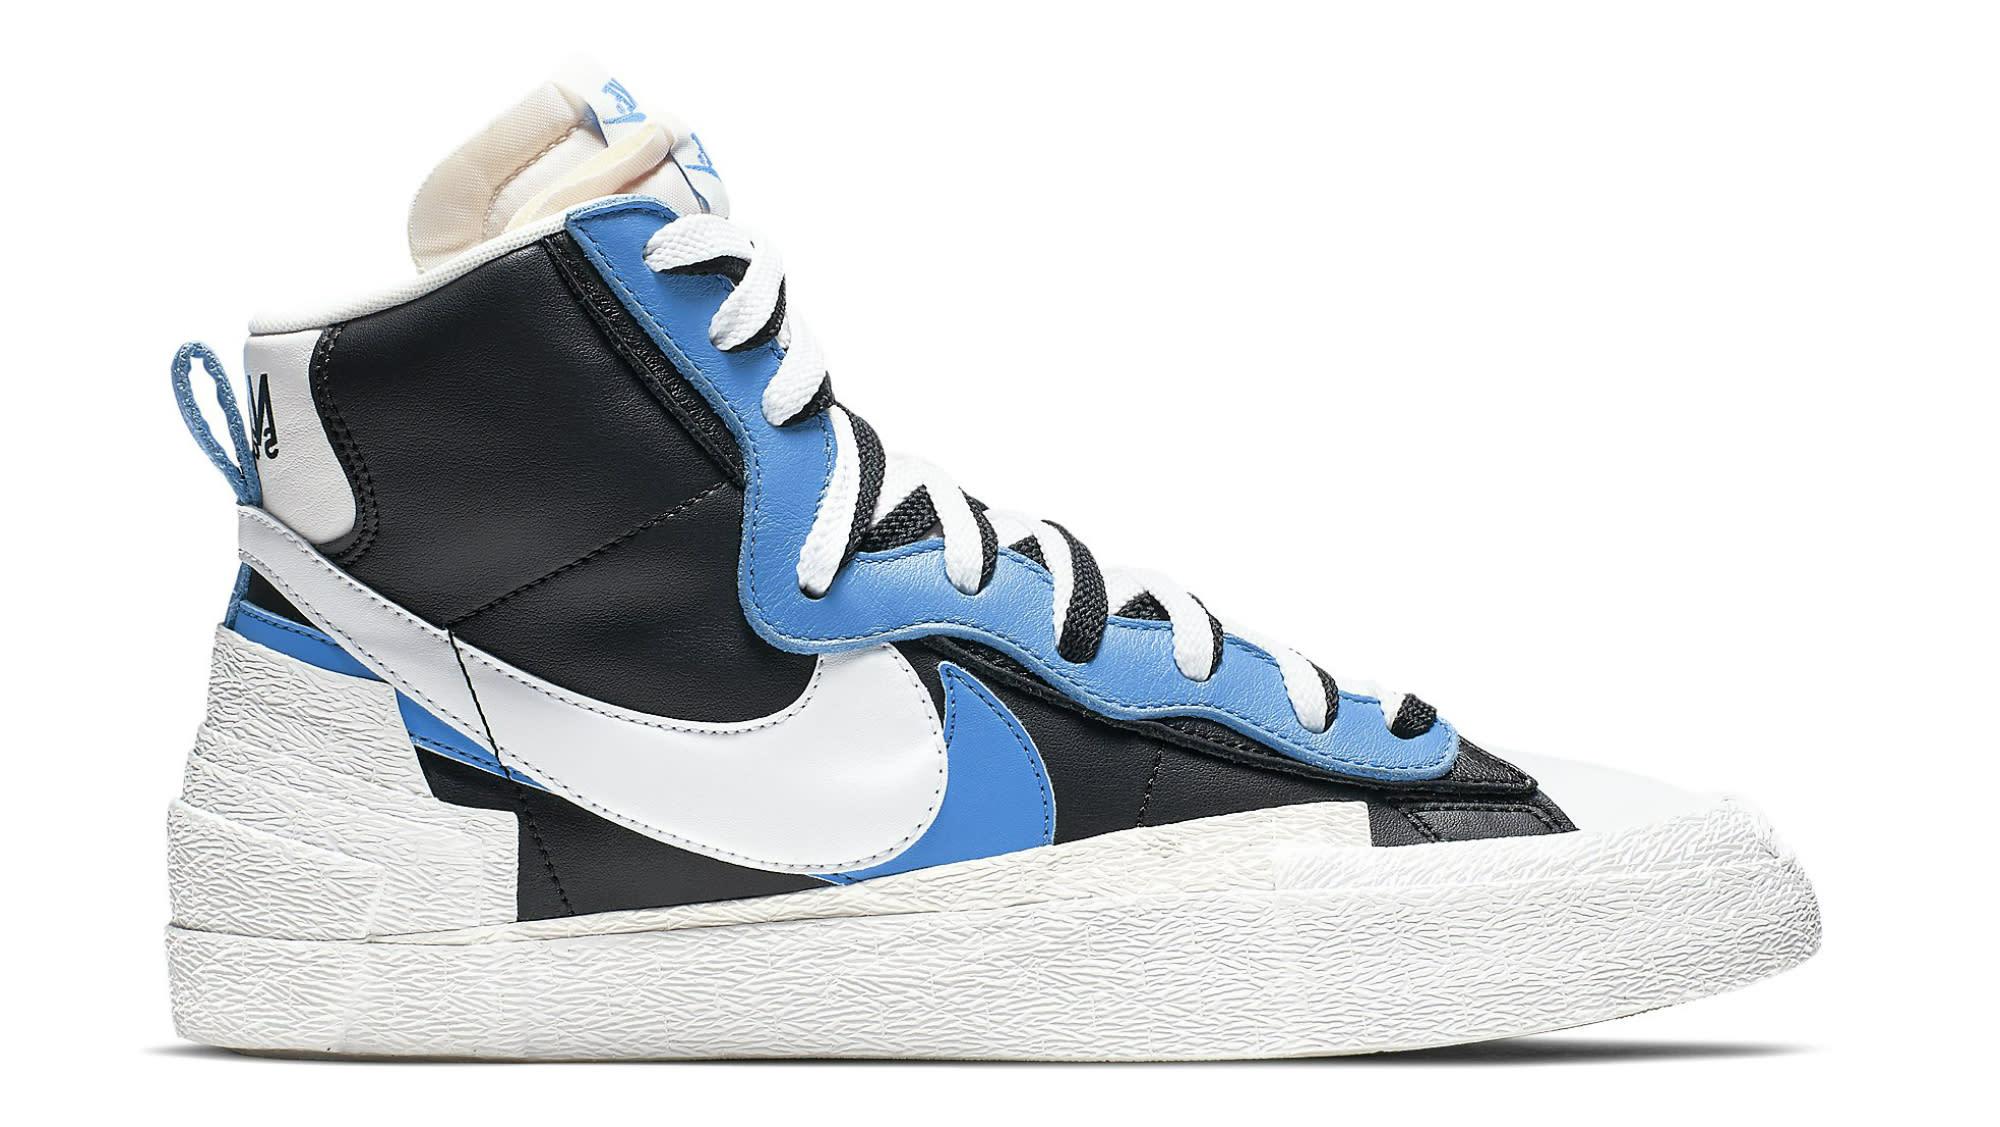 sacai-nike-blazer-high-black-white-university-blue-sail-bv0072-001-release-date